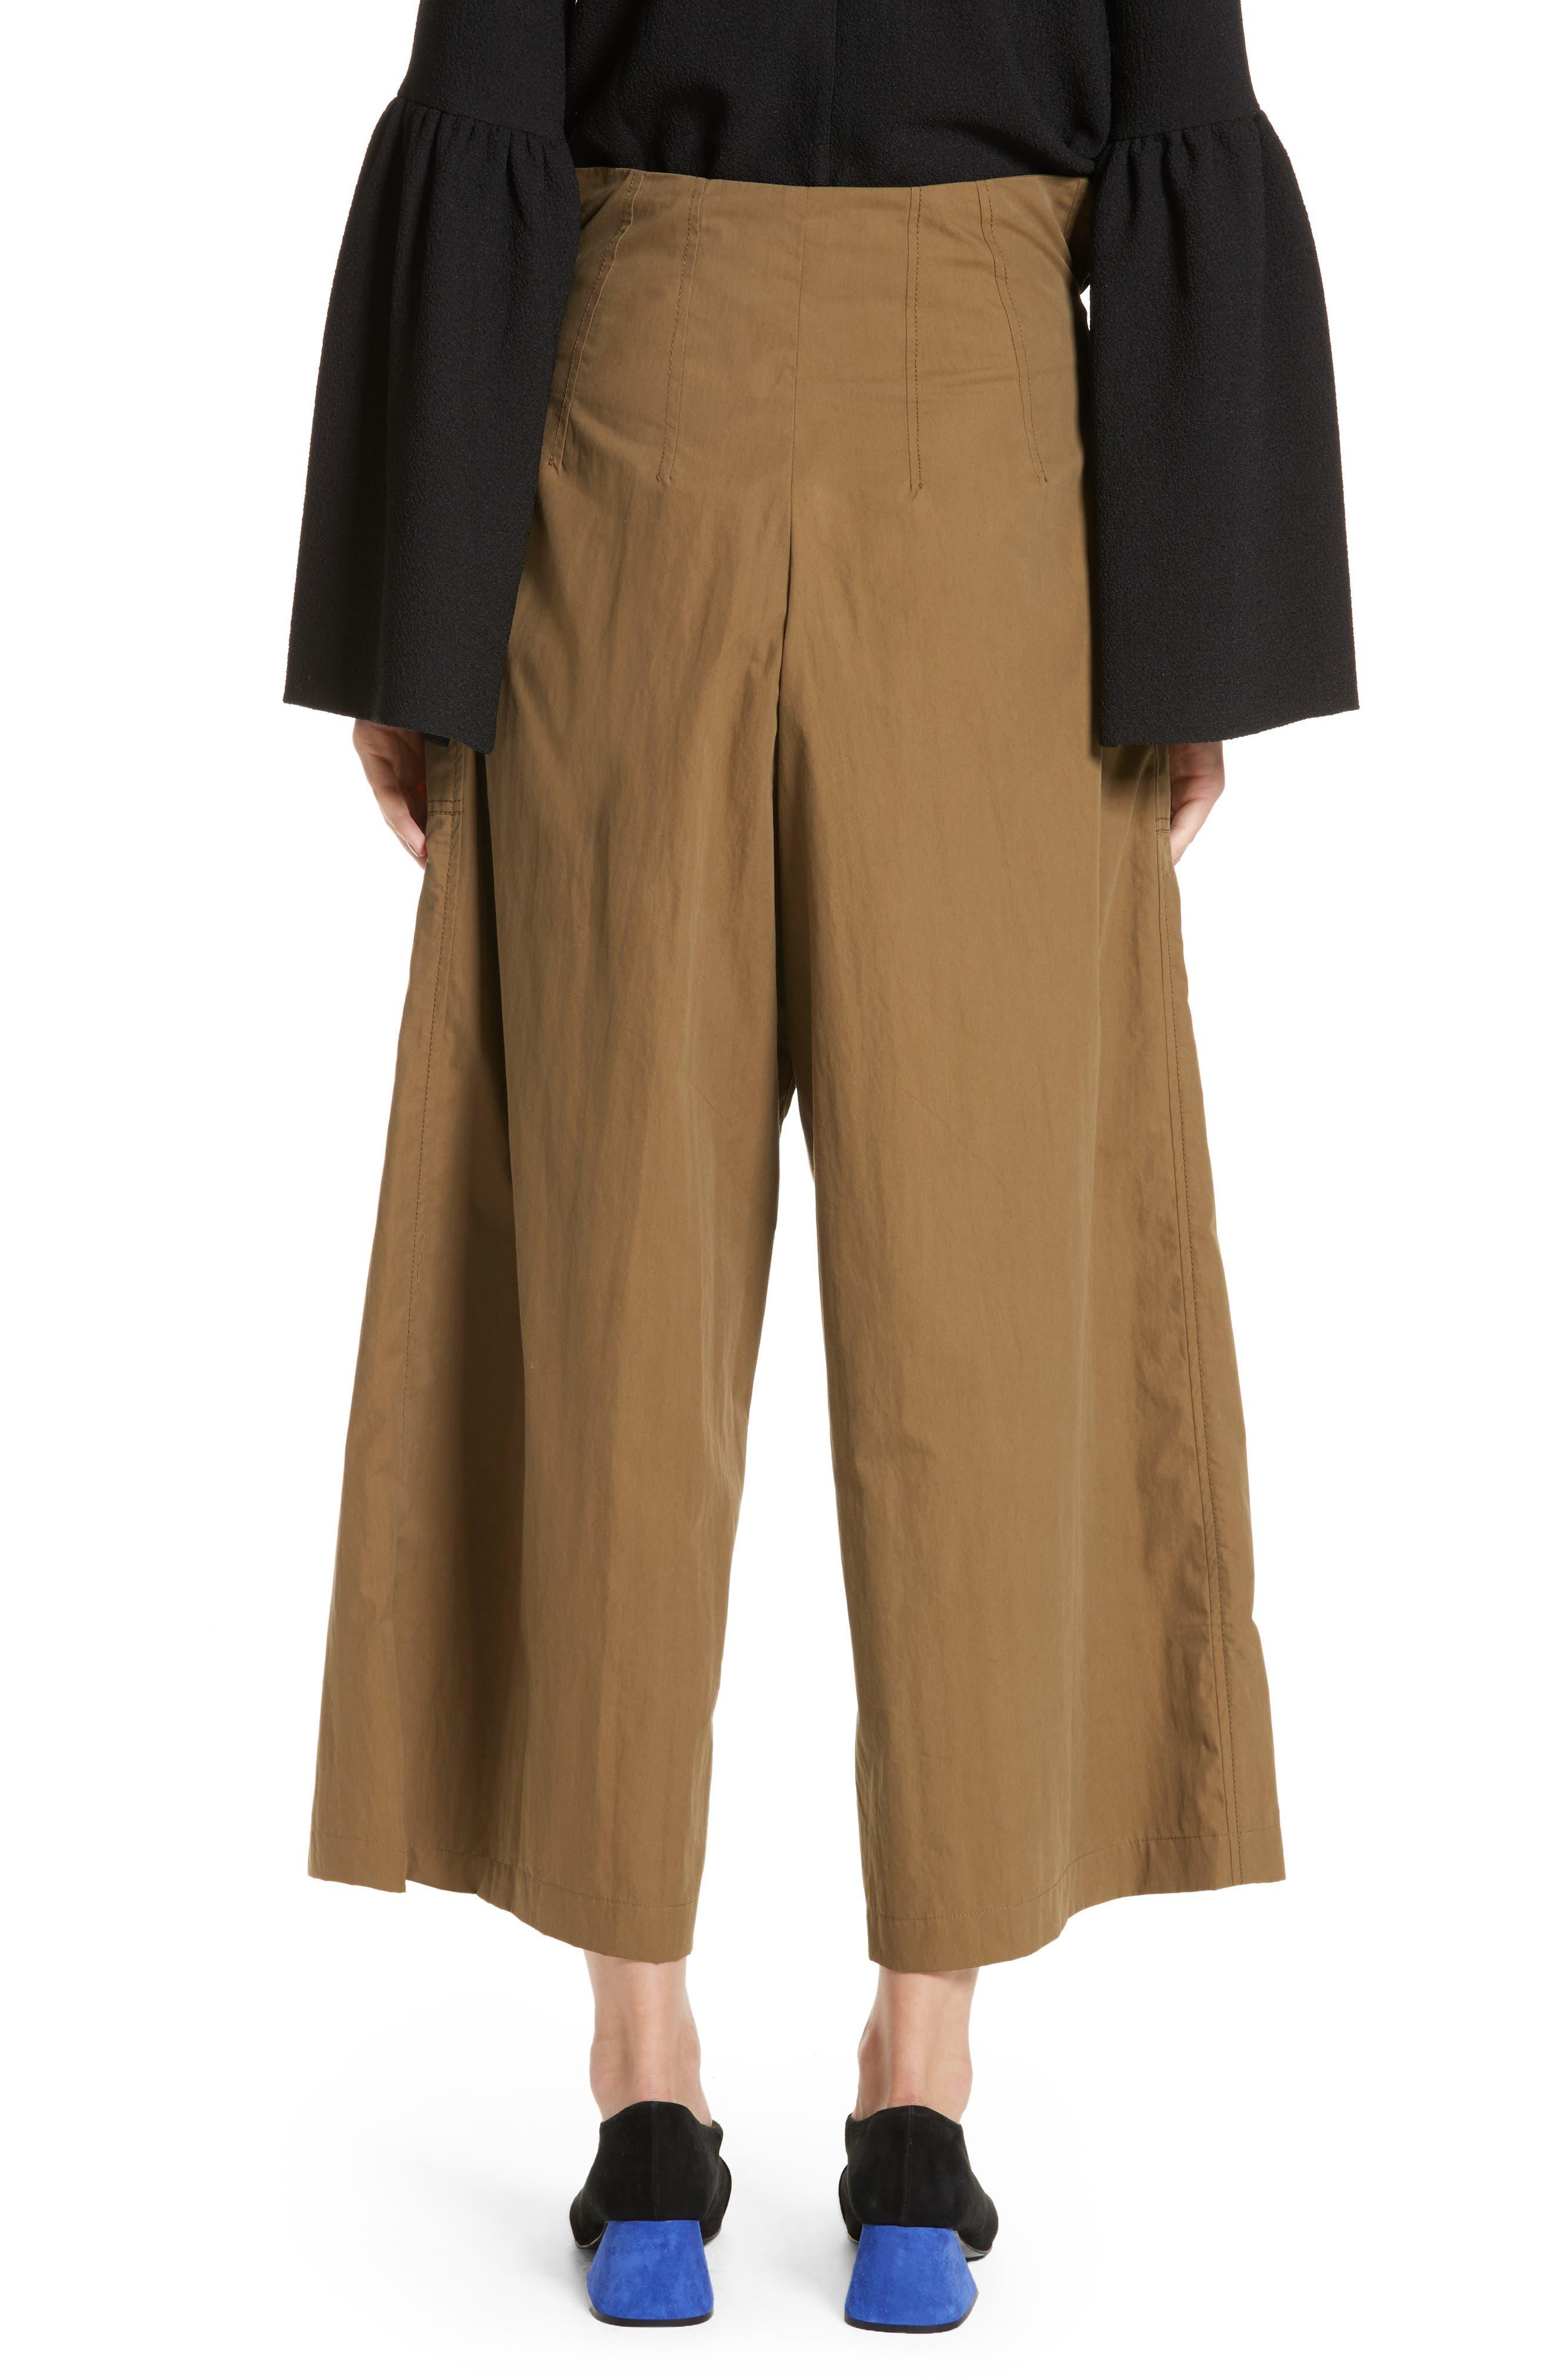 Tilly Belted Paperbag Pants,                             Alternate thumbnail 2, color,                             310